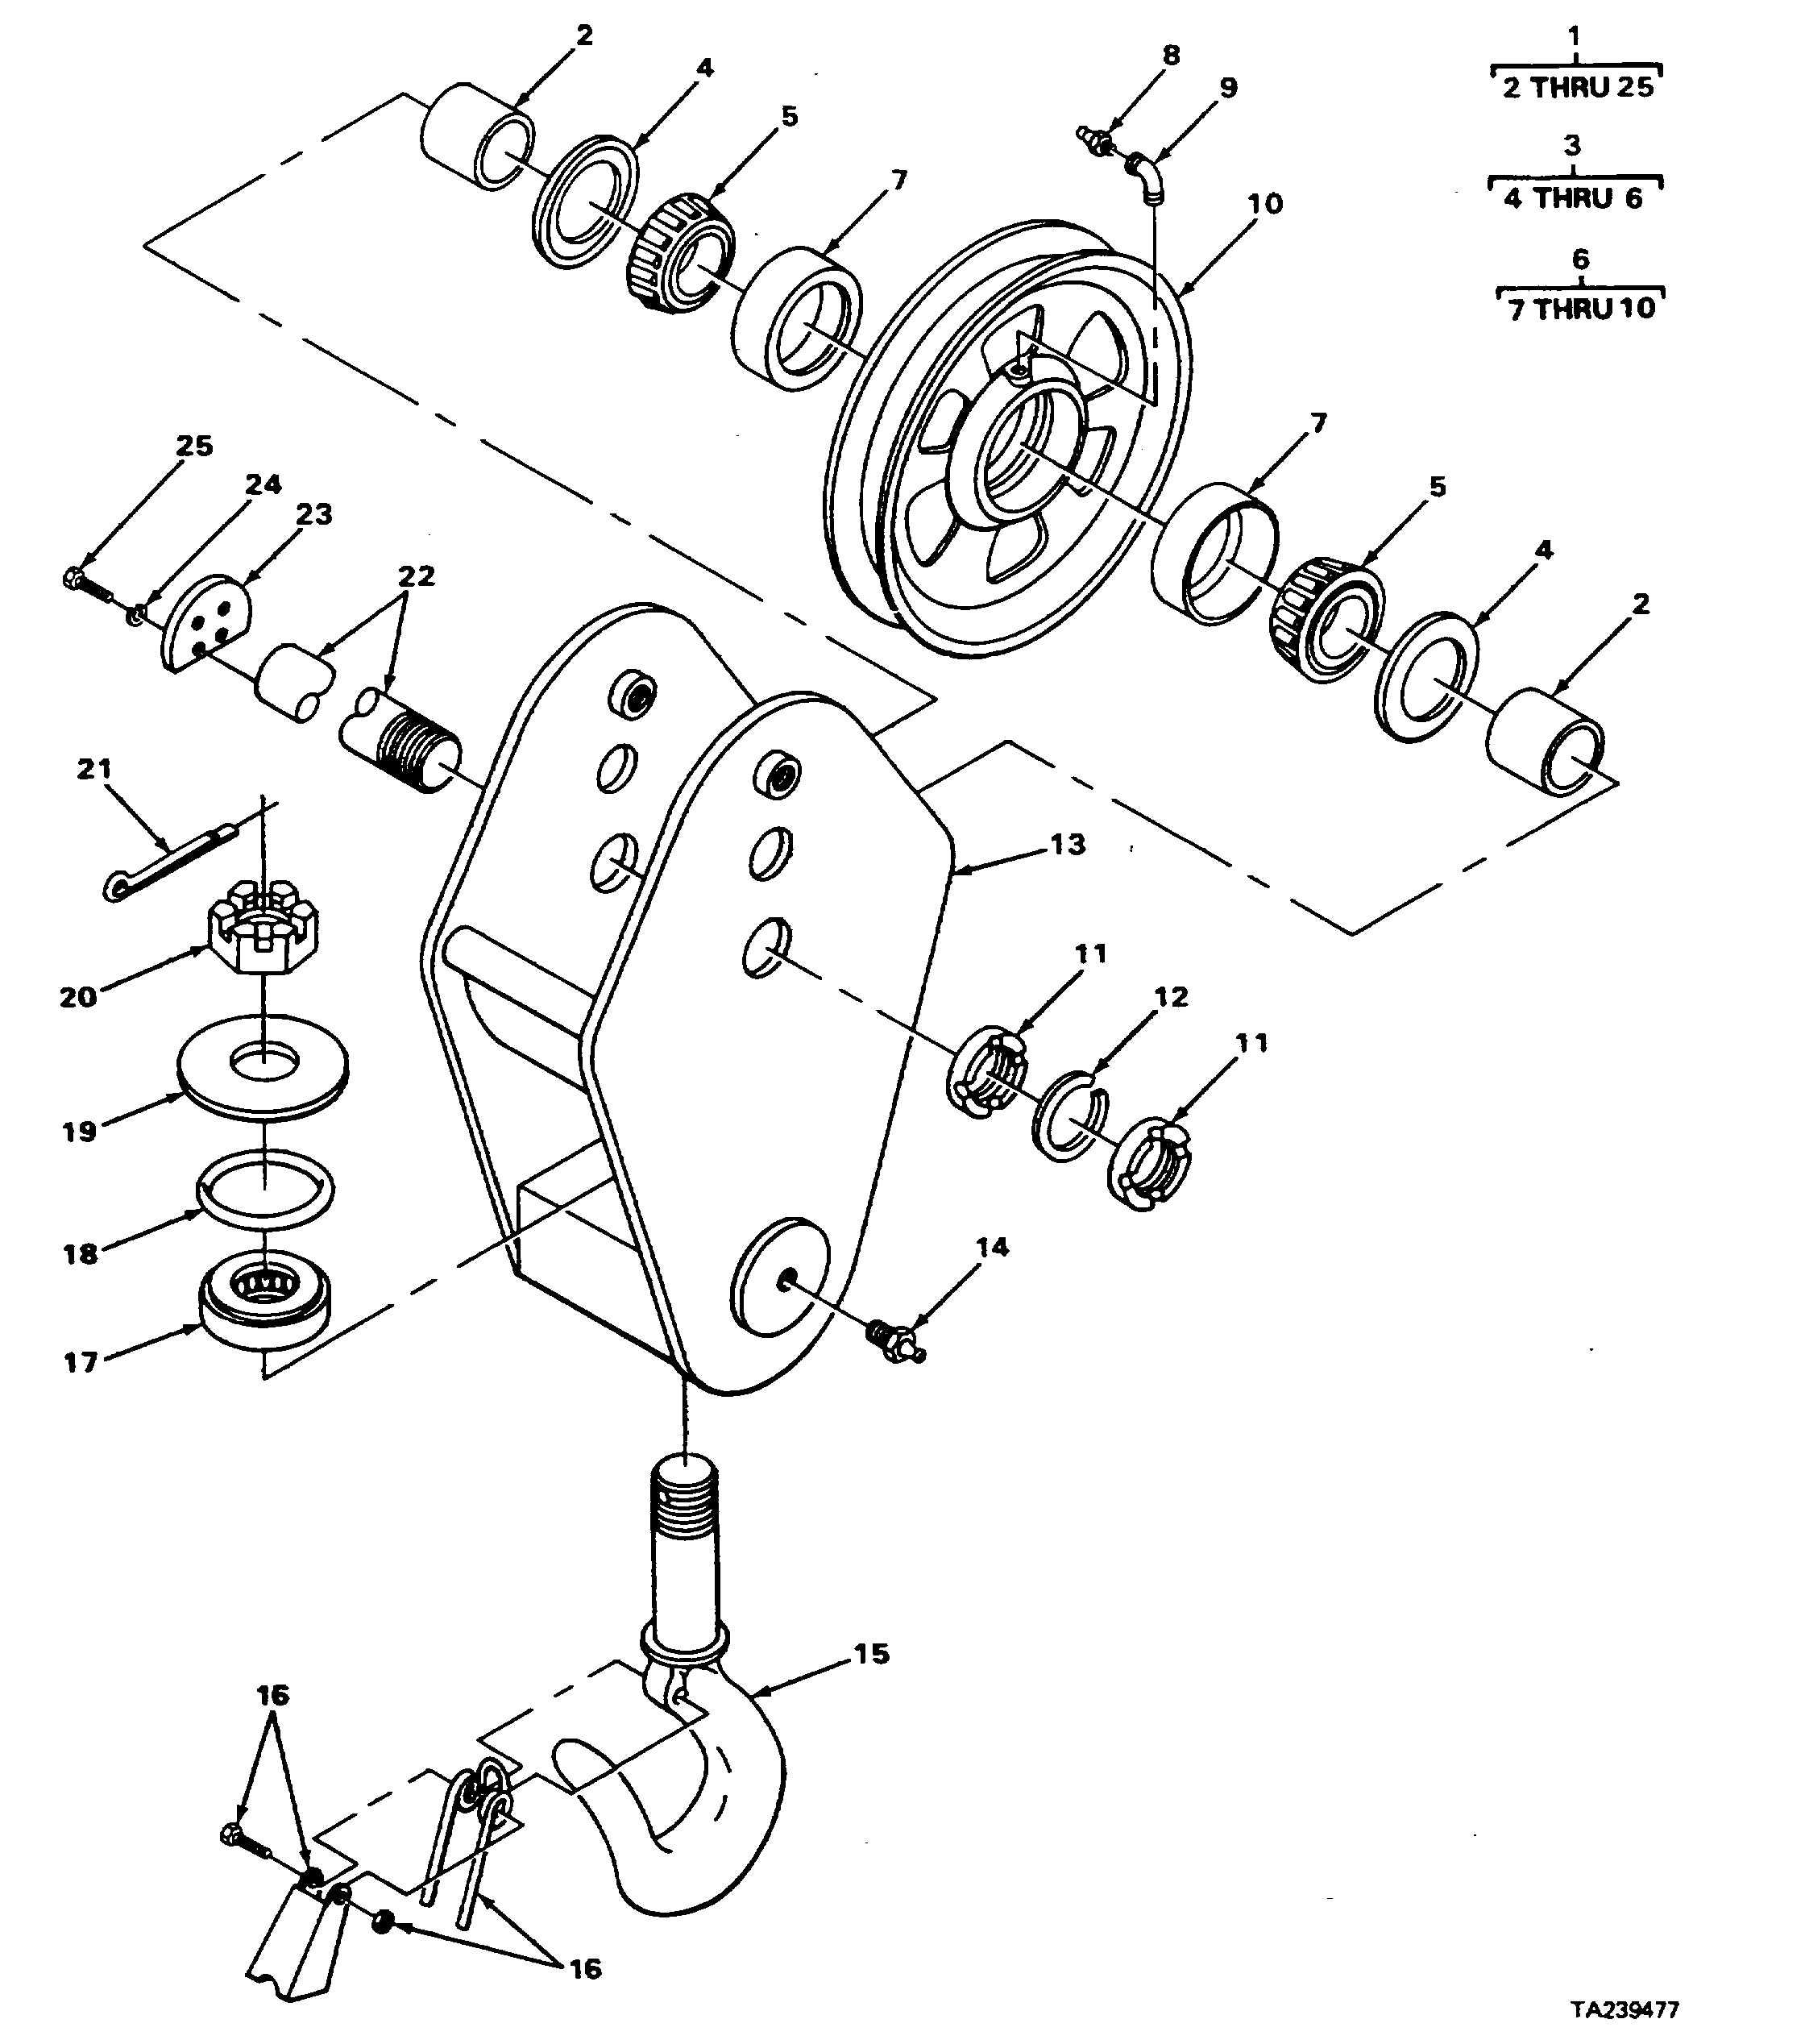 crane parts diagram 2005 ford f150 headlight wiring truck imageresizertool com